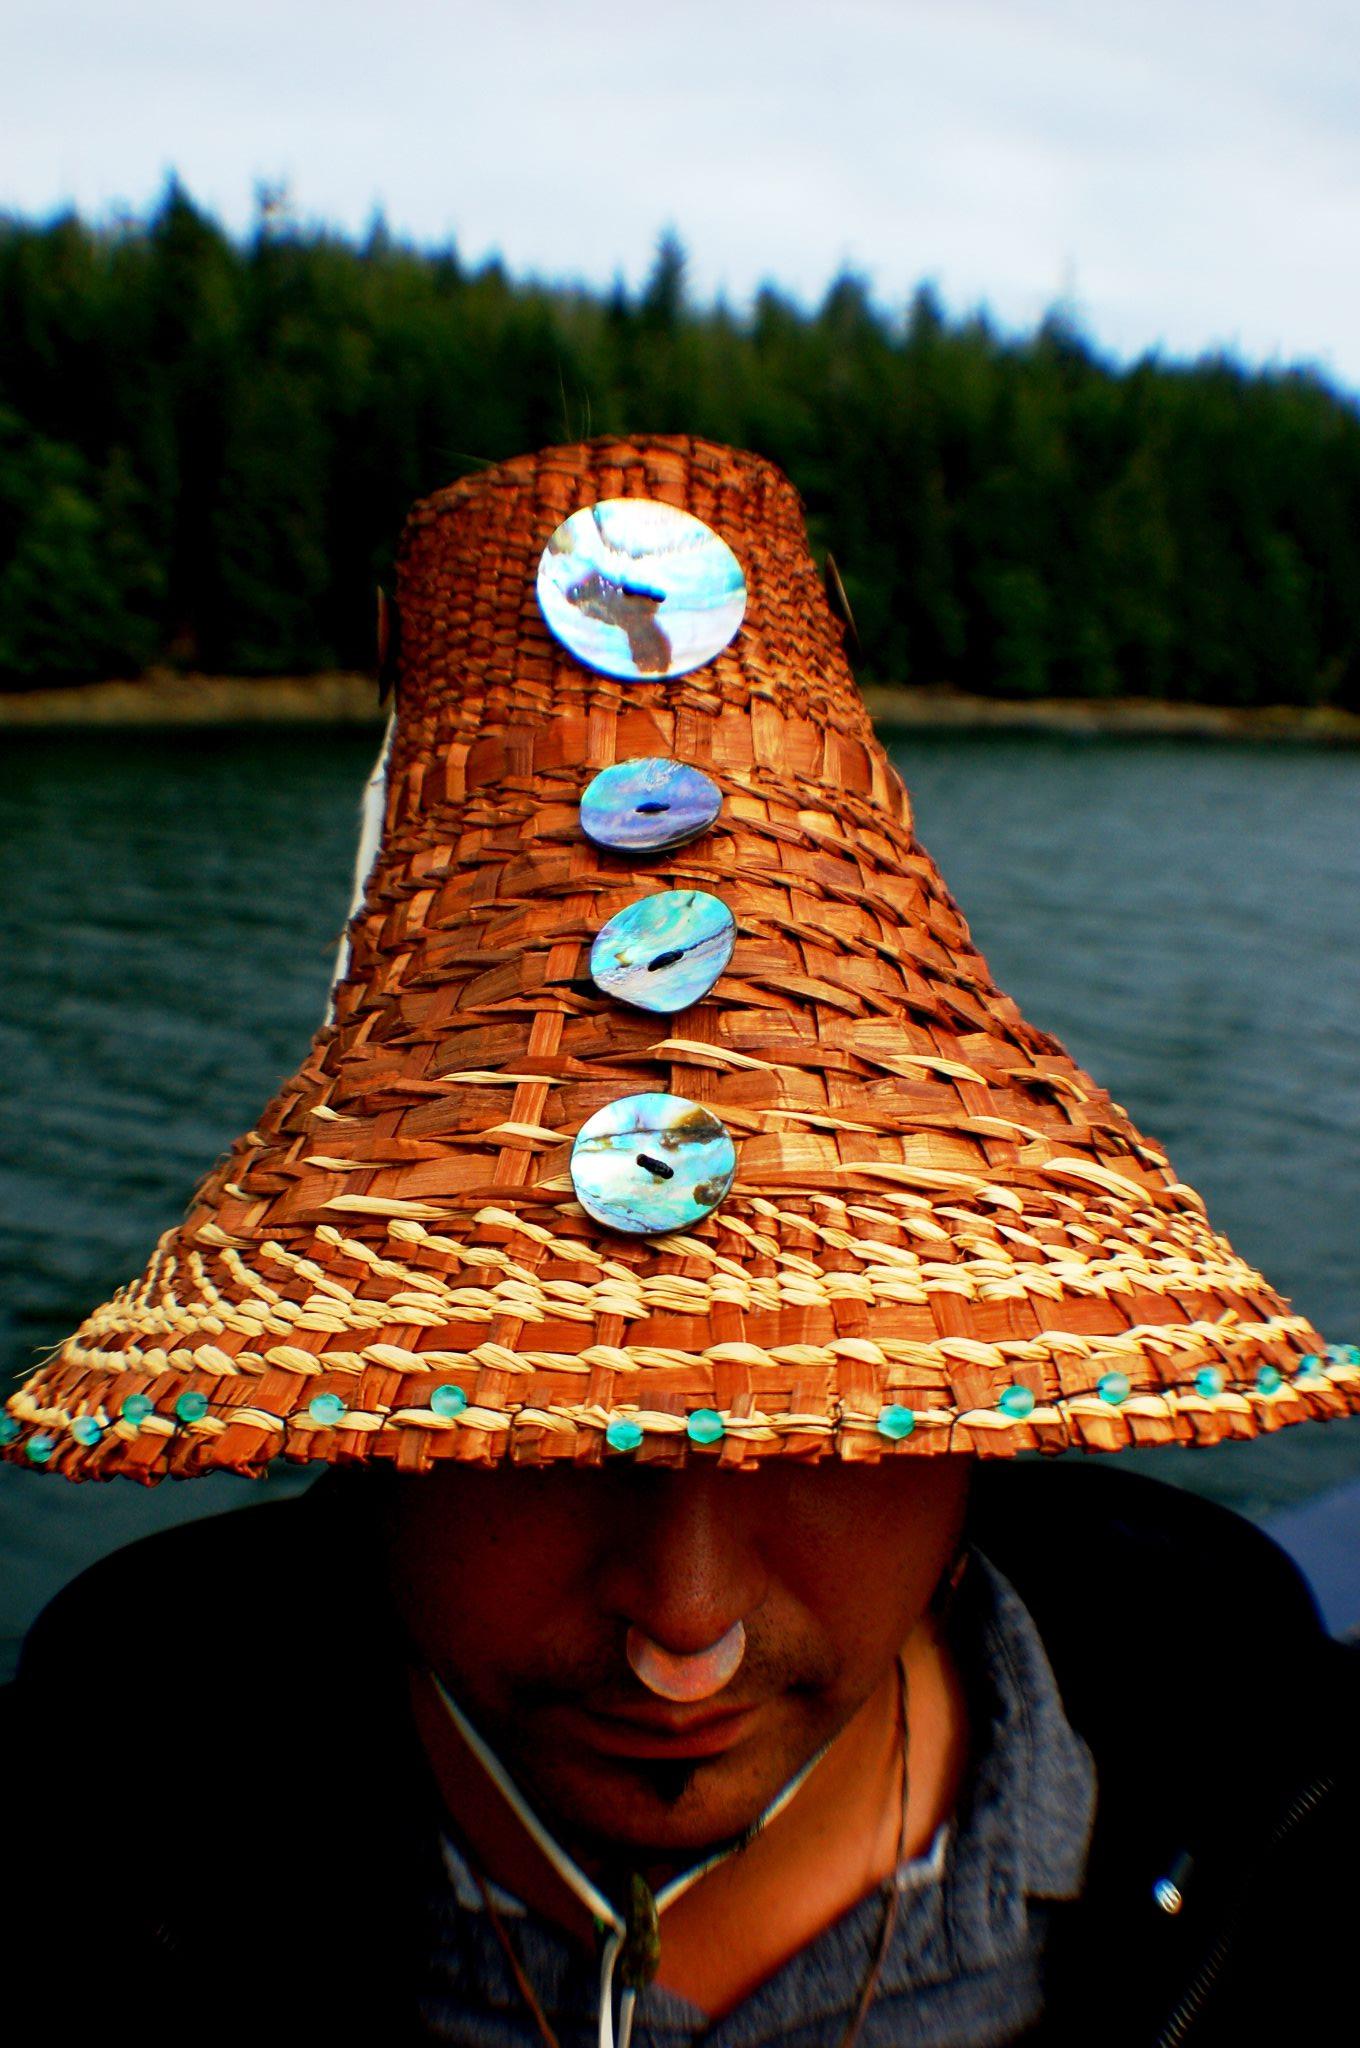 Seans Hat